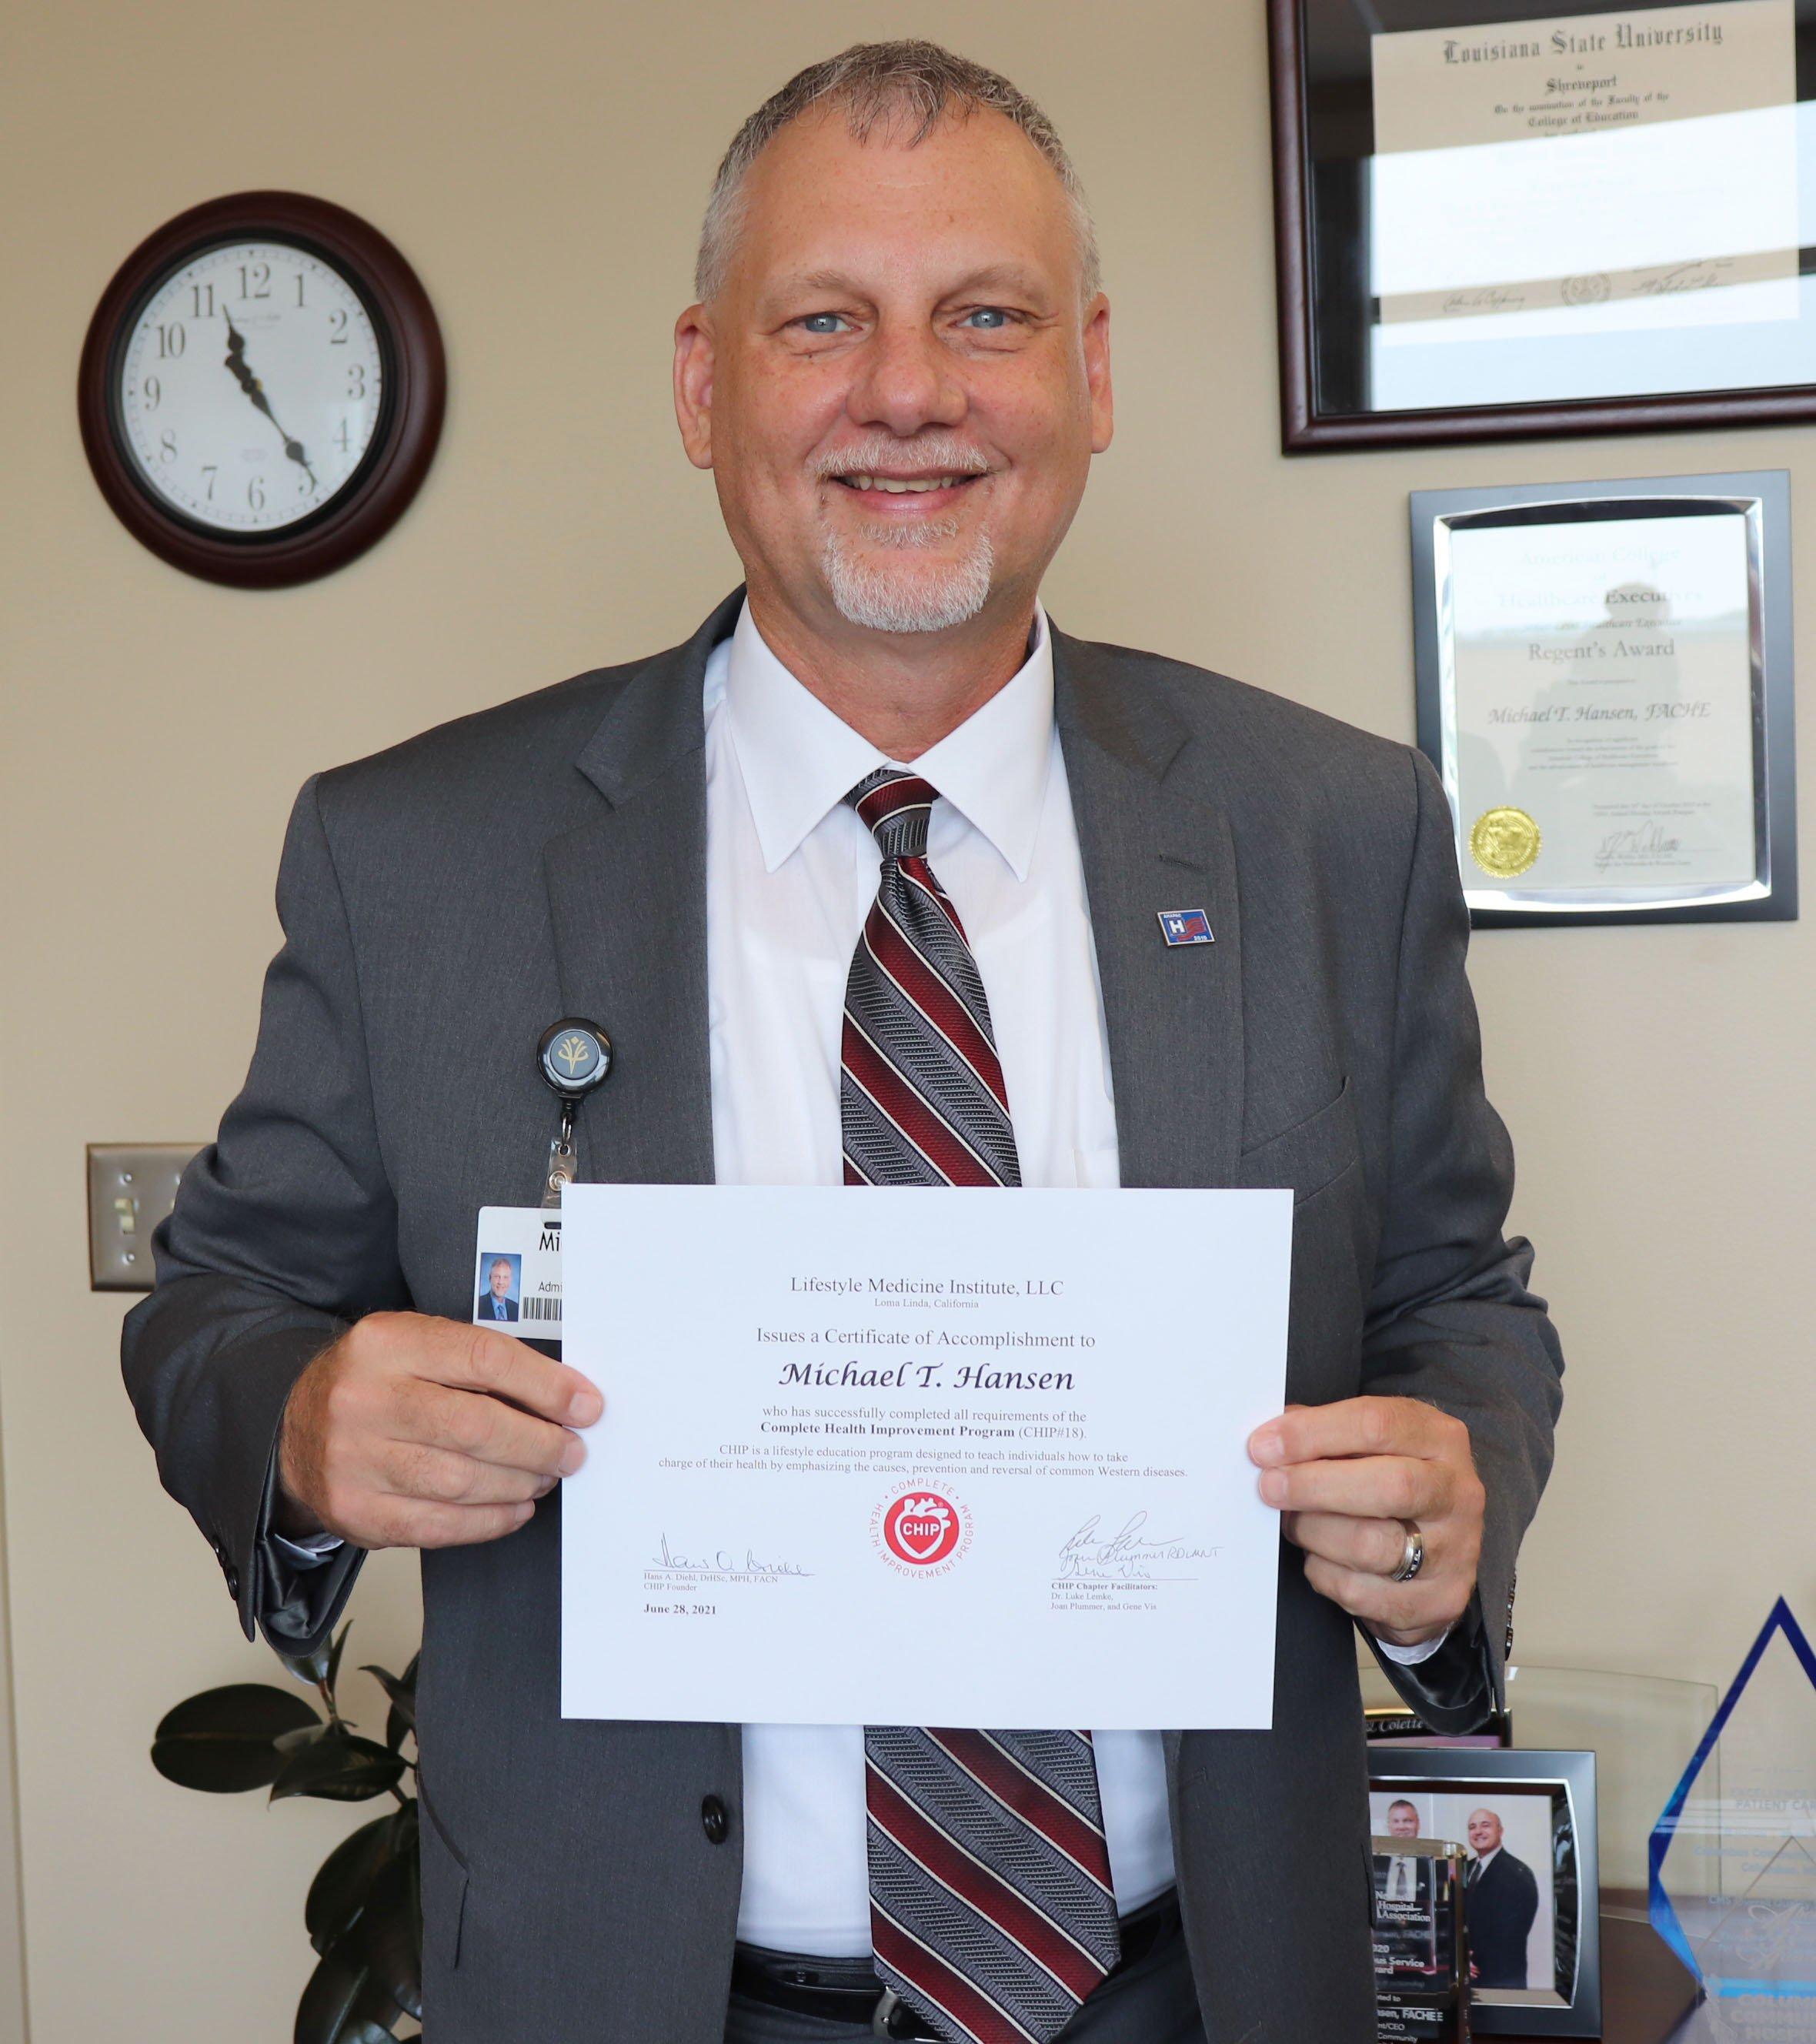 Columbus Community Hospital president benefits from healthy lifestyle program